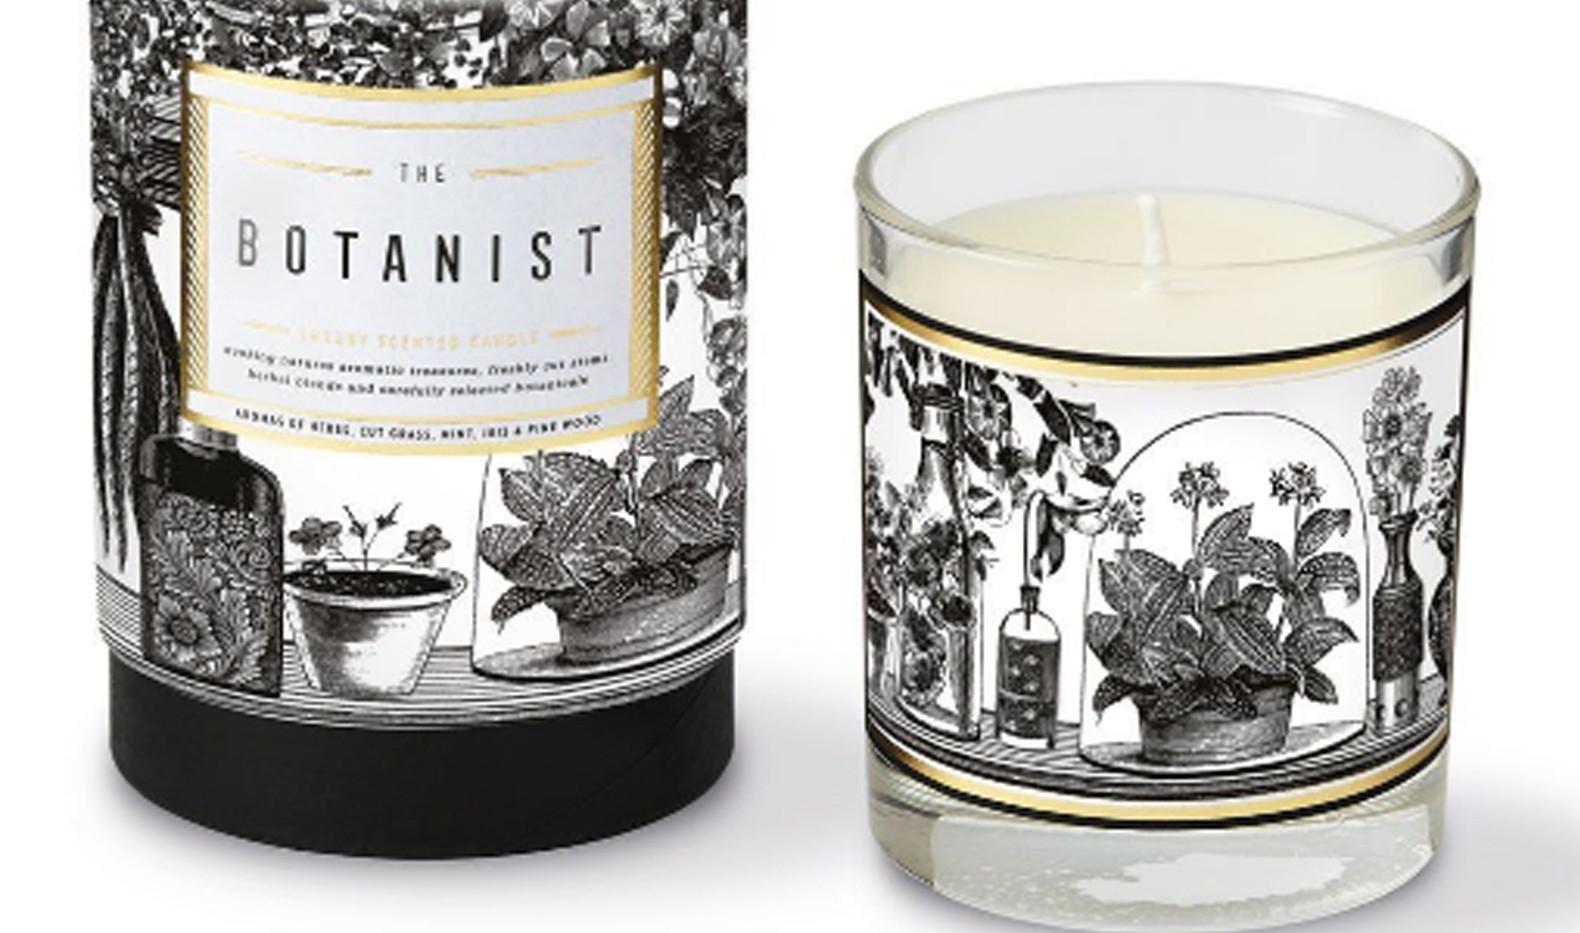 The Botanist Candle.jpg